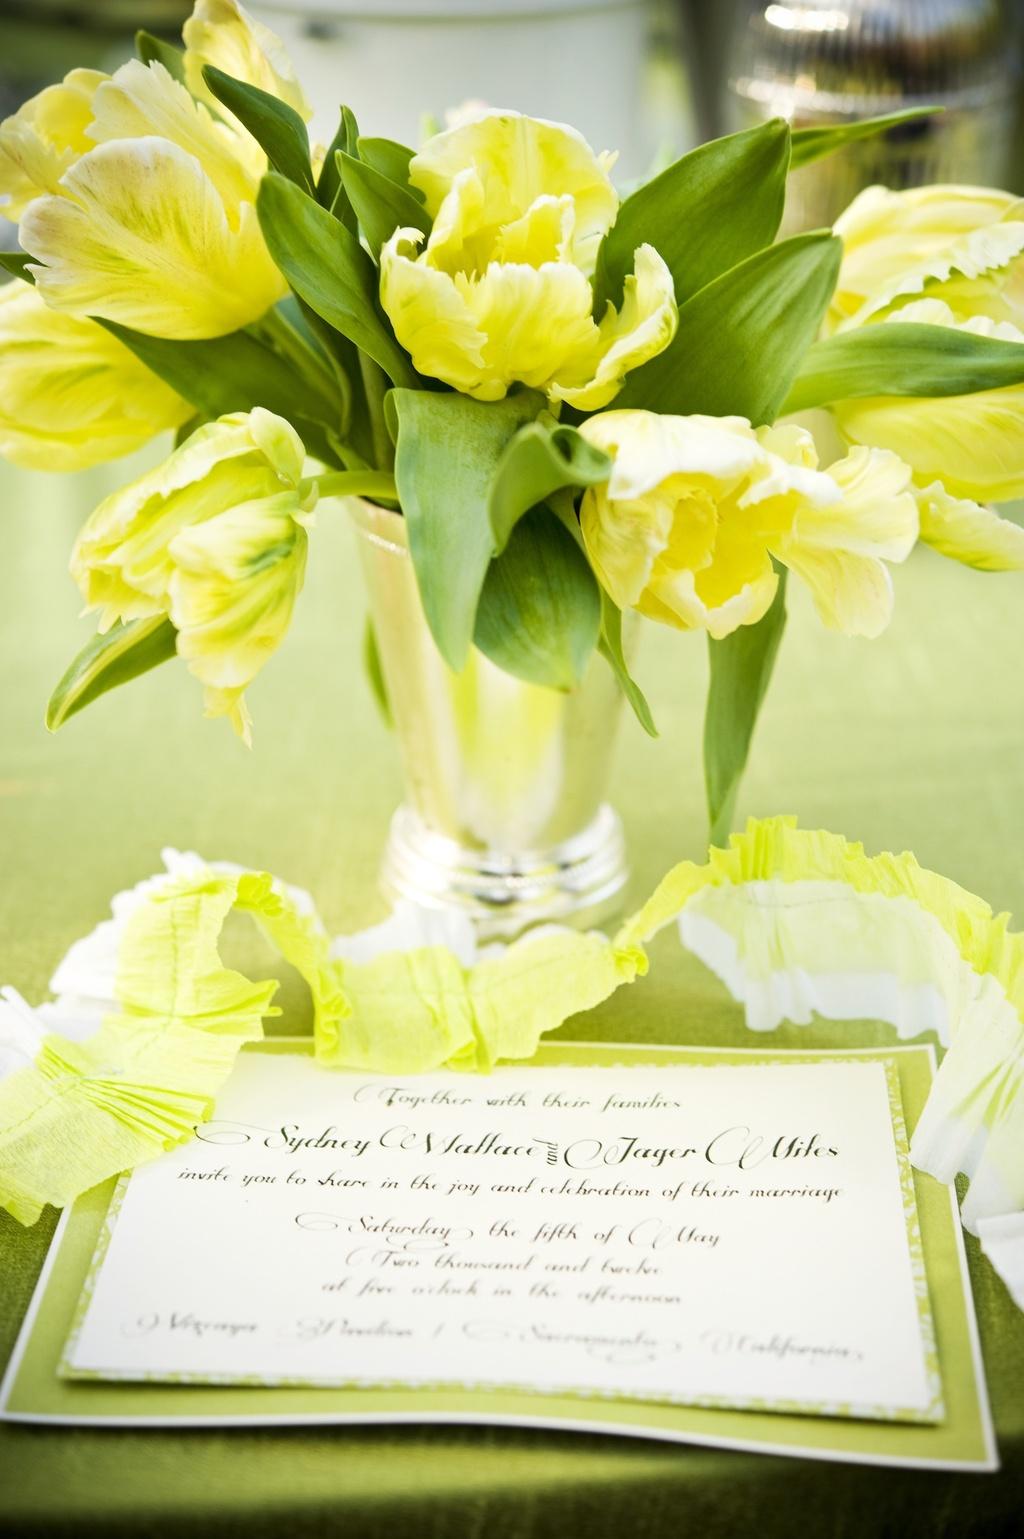 Bright-neon-wedding-flowers-silver-vases-garden-wedding.full